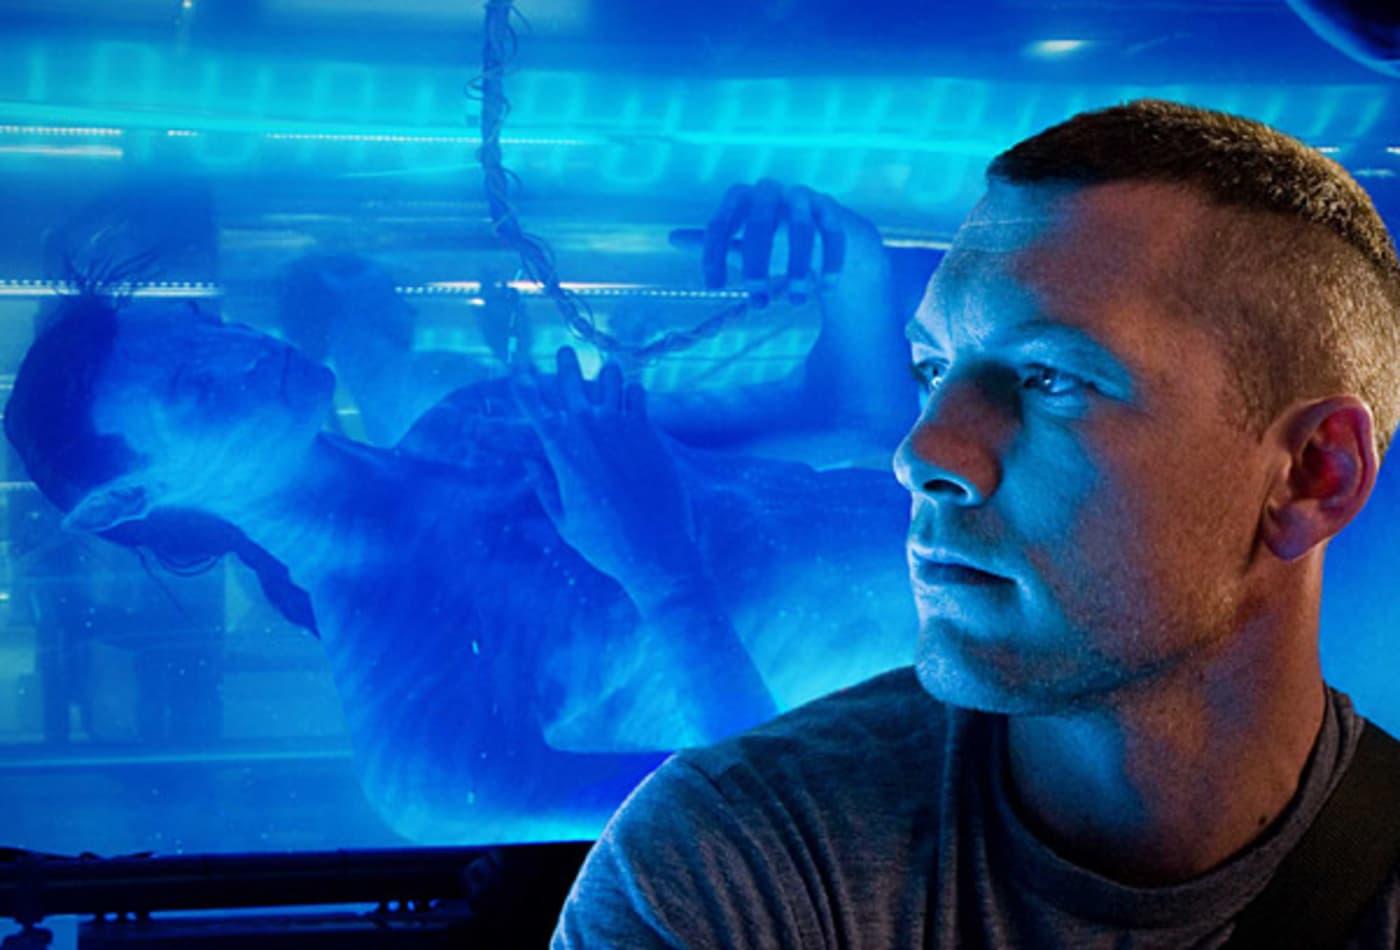 48769133 Avatar-10-Most-Pirated-Movies-CNBC.jpg